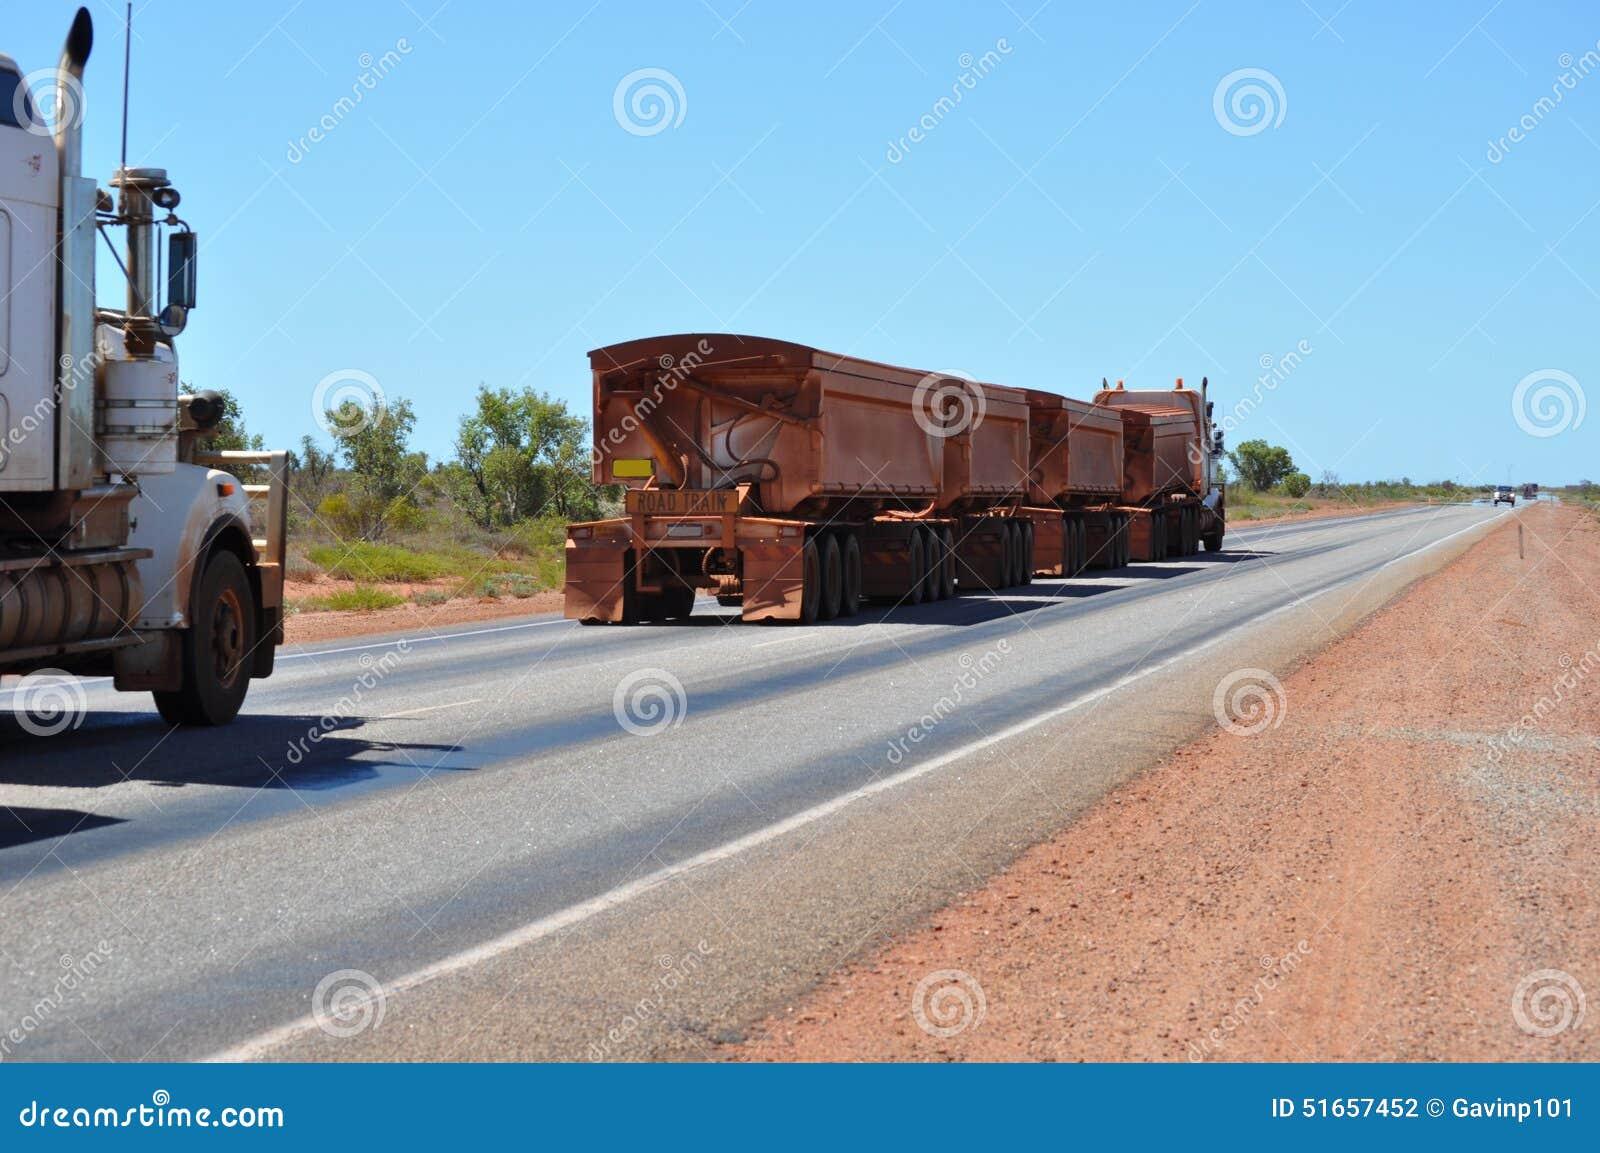 long roadtrain truck in australia stock photo image of tires trailers 51657452. Black Bedroom Furniture Sets. Home Design Ideas